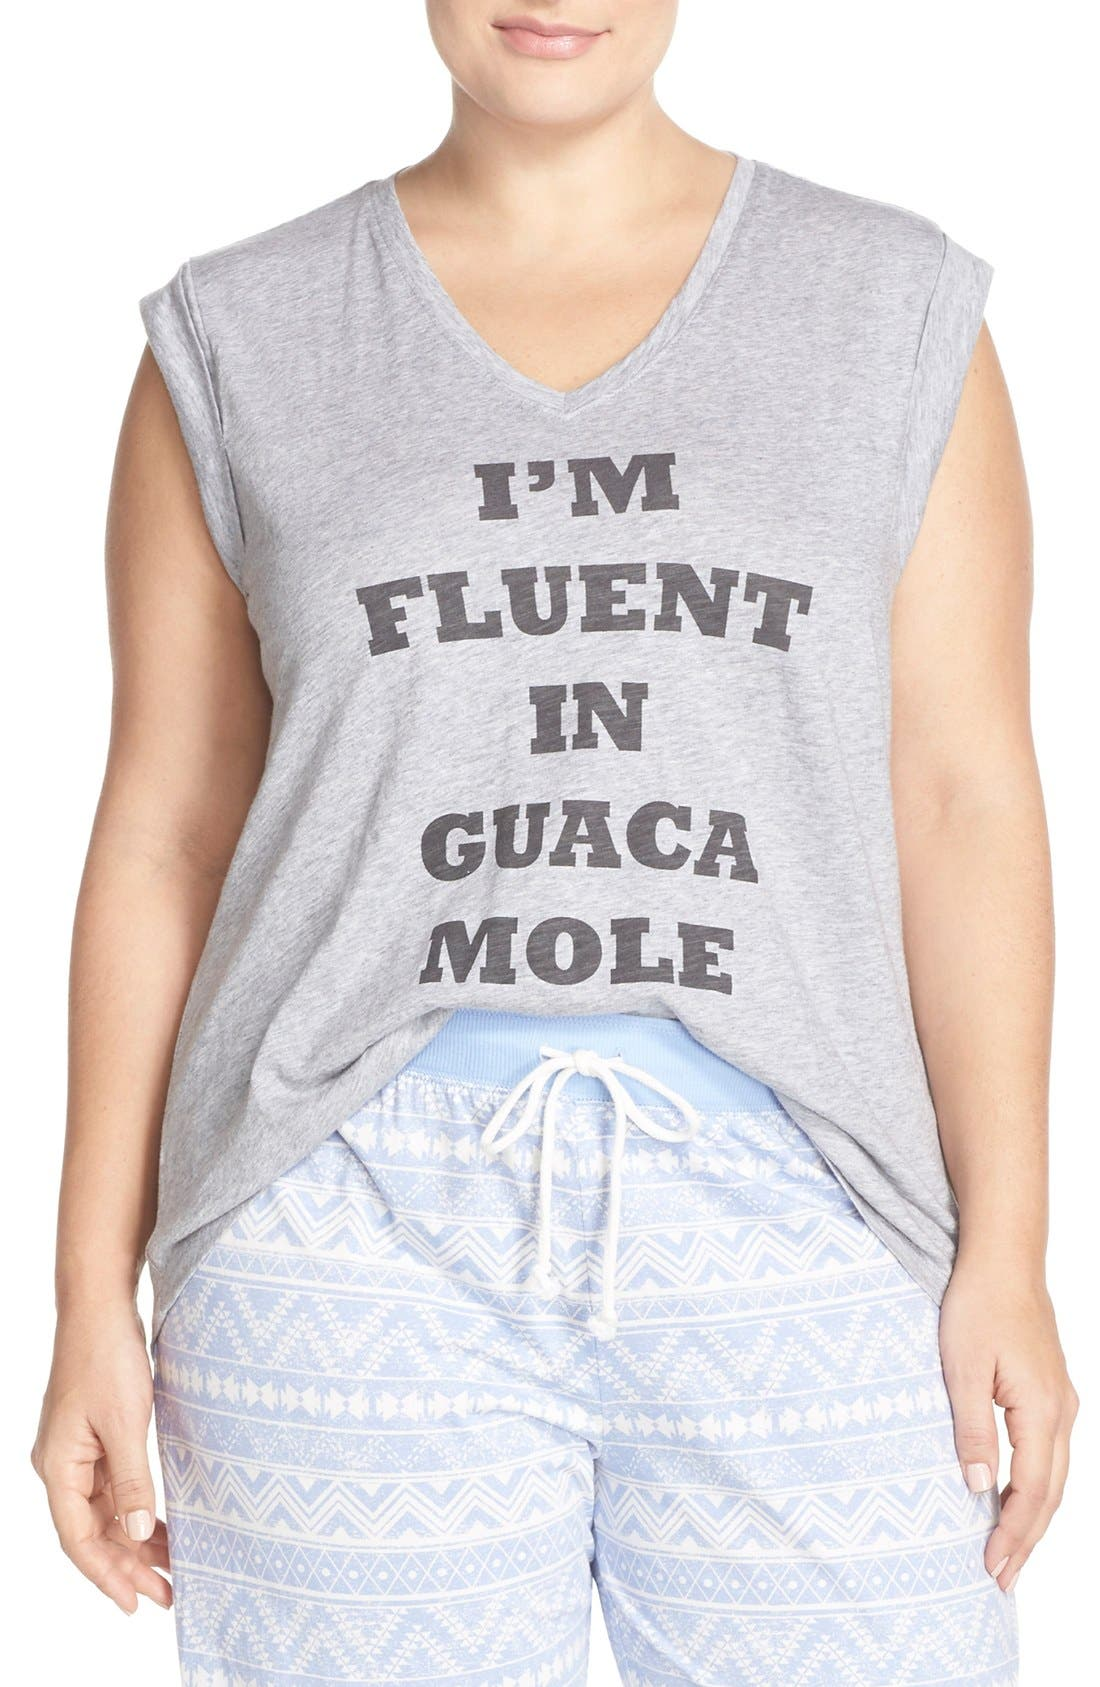 Alternate Image 1 Selected - COZY ZOE 'I'm Fluent In Guacamole' Graphic Tee (Plus Size)